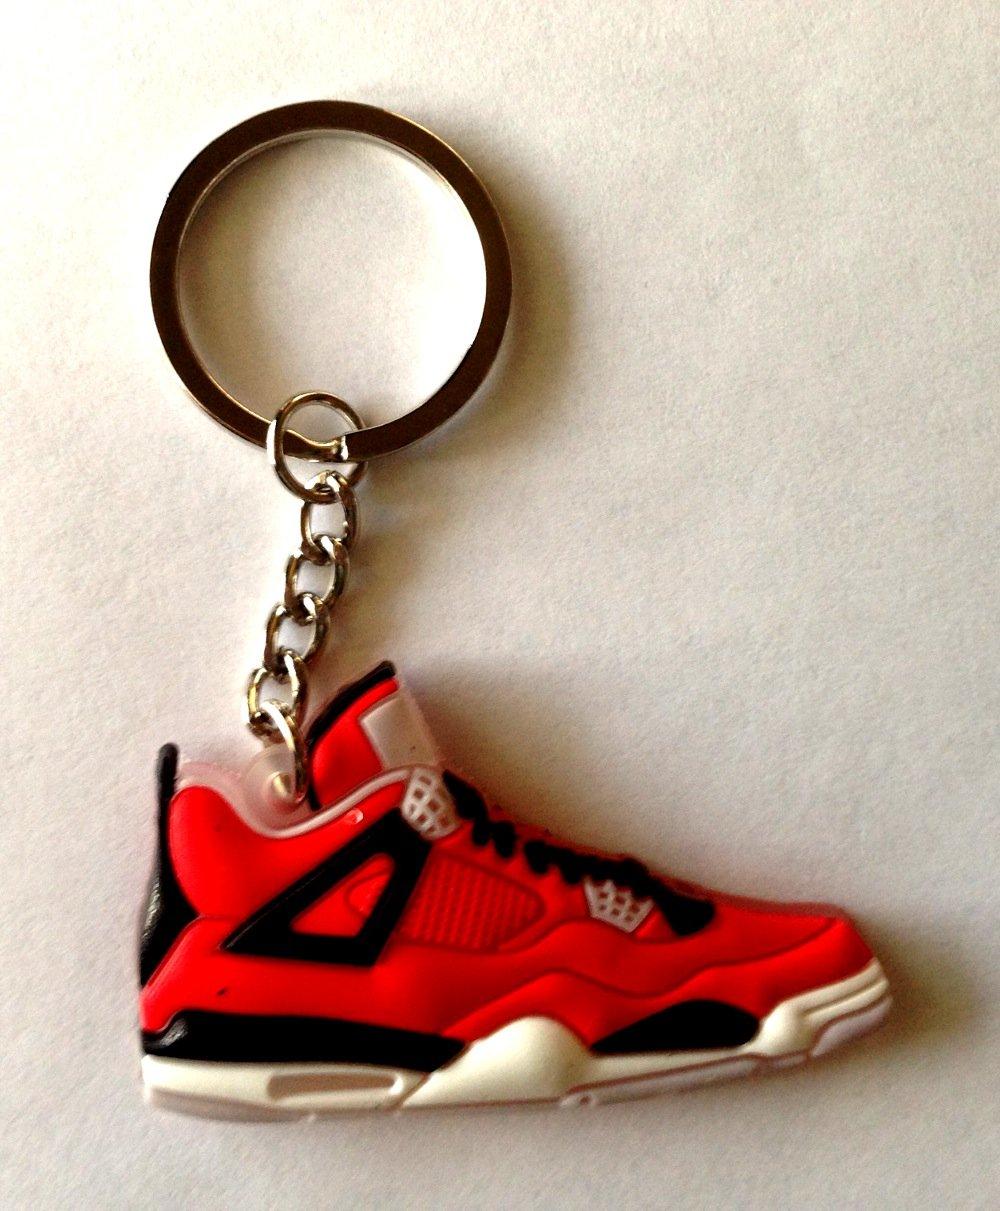 sports shoes 89afc 5139c Amazon.com   Air Jordan 4 IV Retro Toro Bravo Red Sneakers Shoes 2D  Keychain Keyring   Everything Else